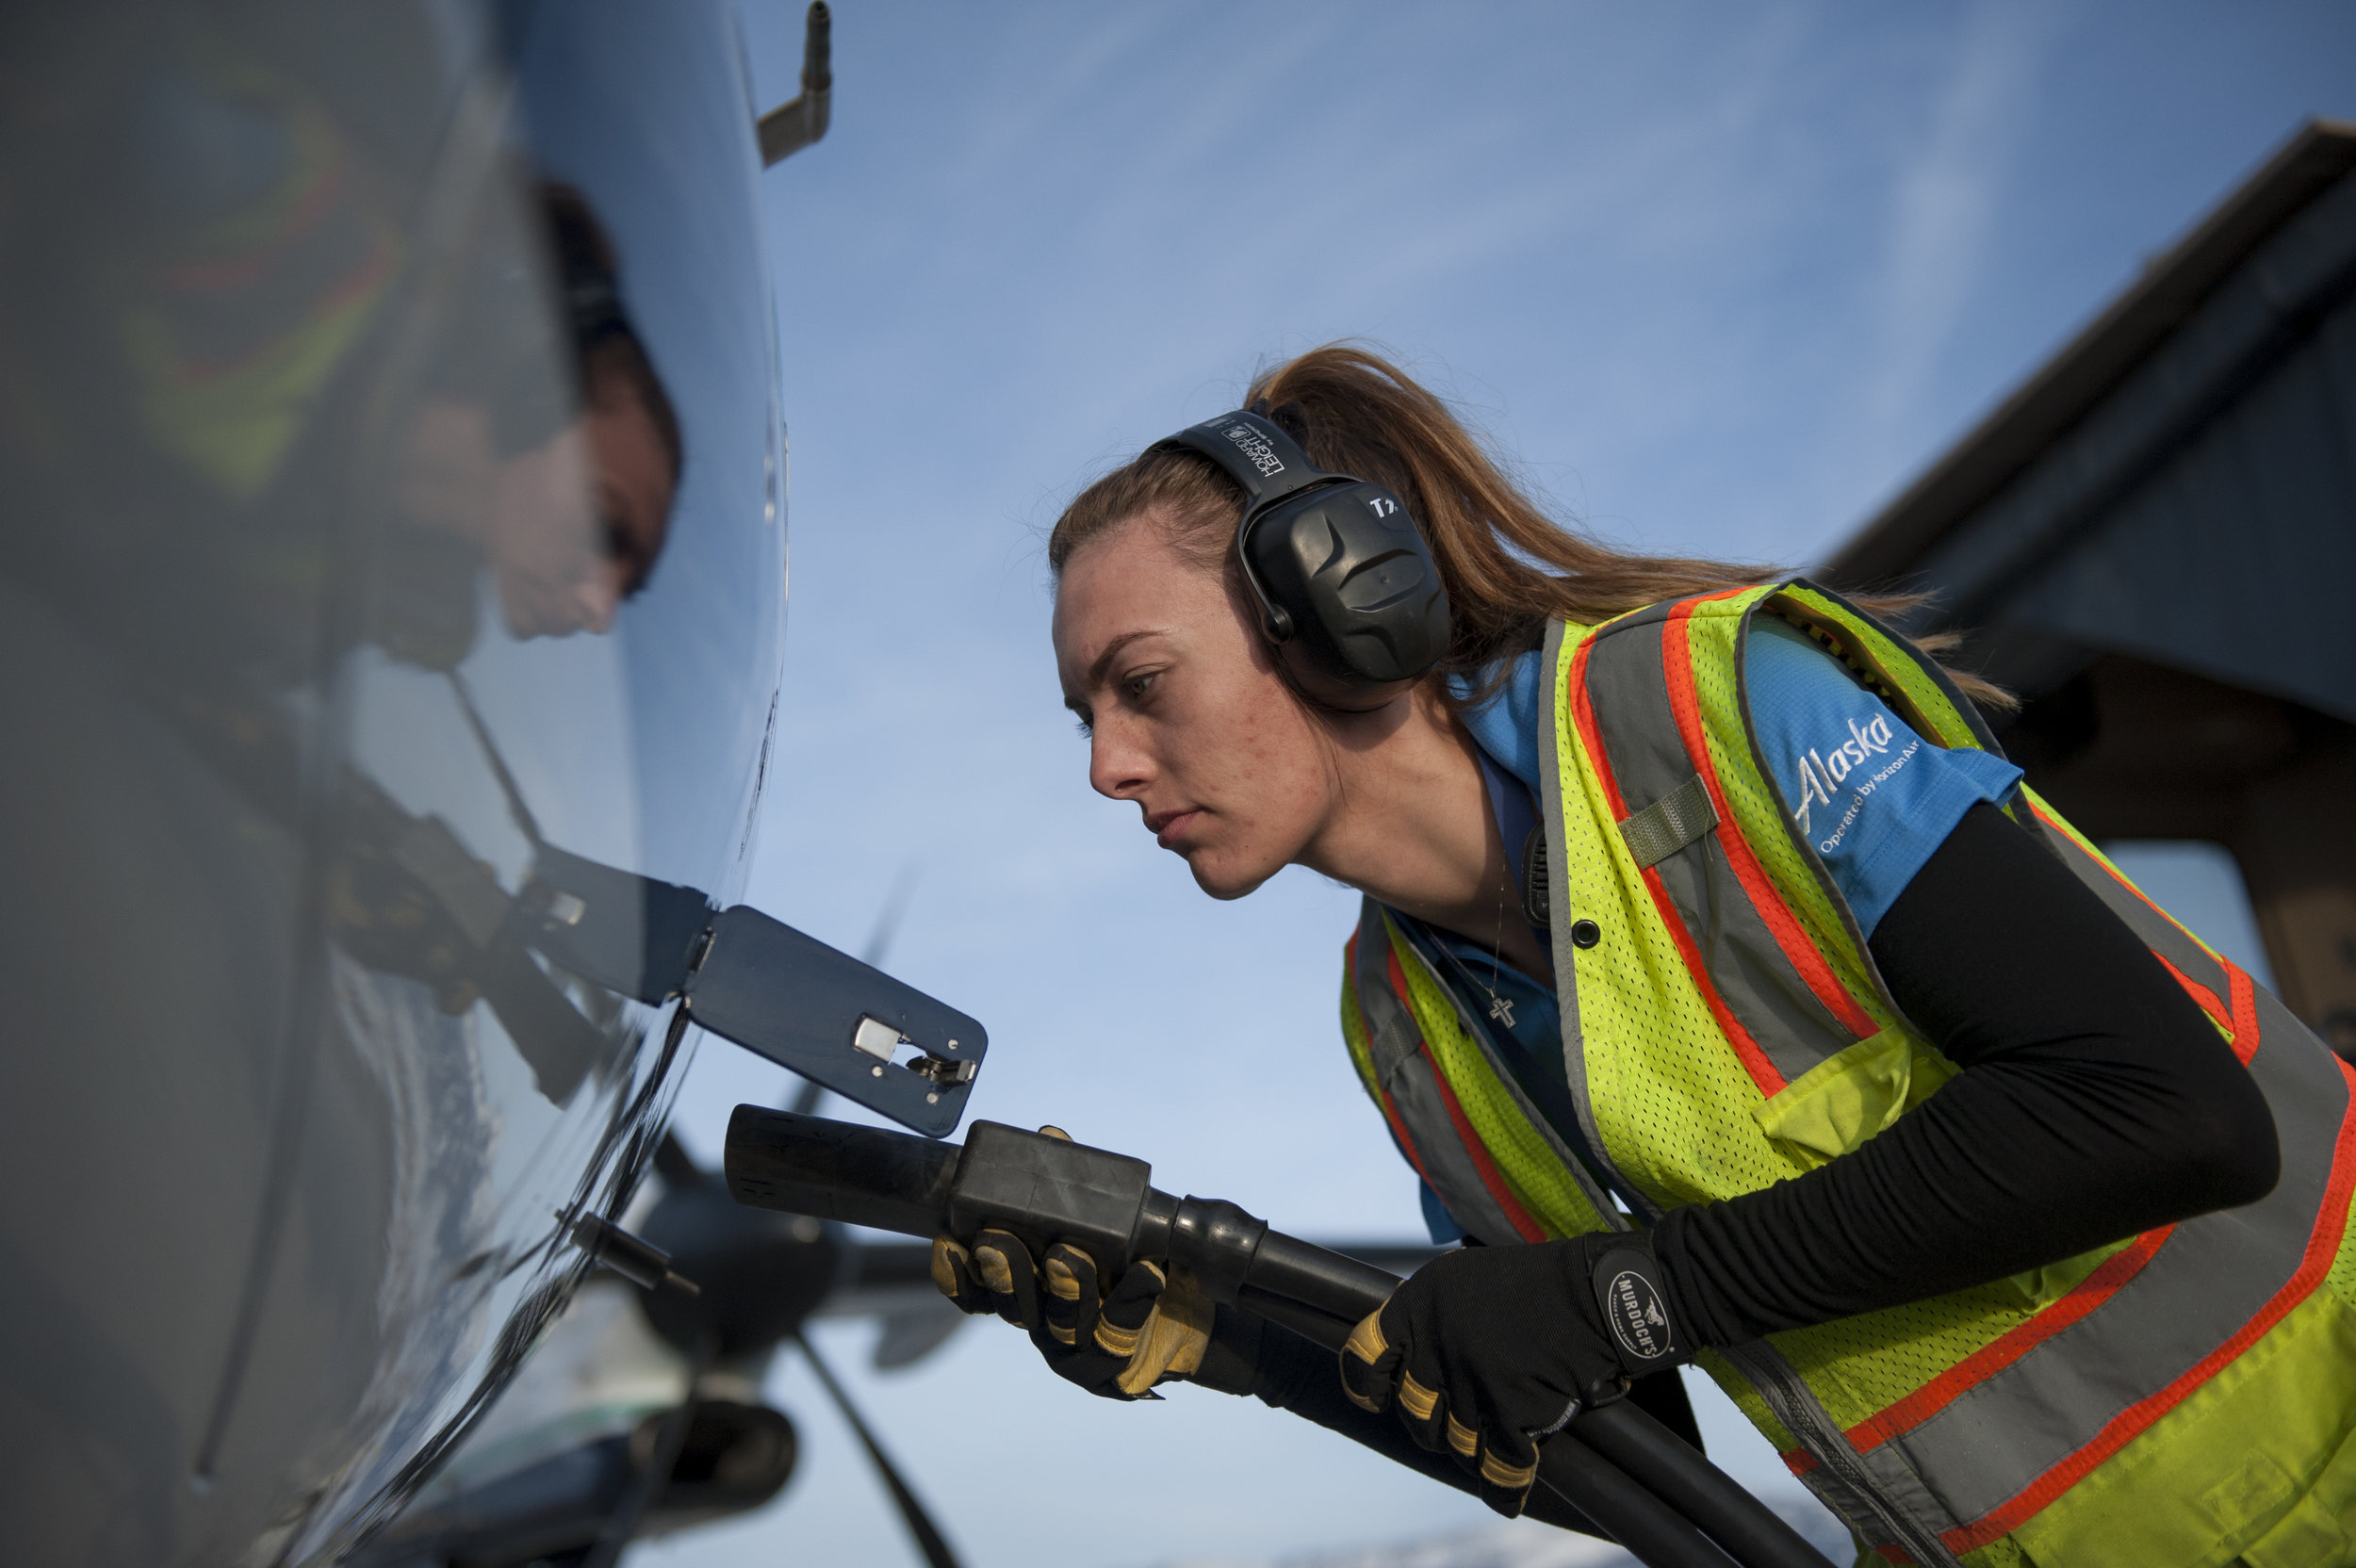 A ramp agent at Bozeman Yellowstone International Airport plugs the GPU cord into a Q400 aircraft Sunday, Feb. 12, 2017.